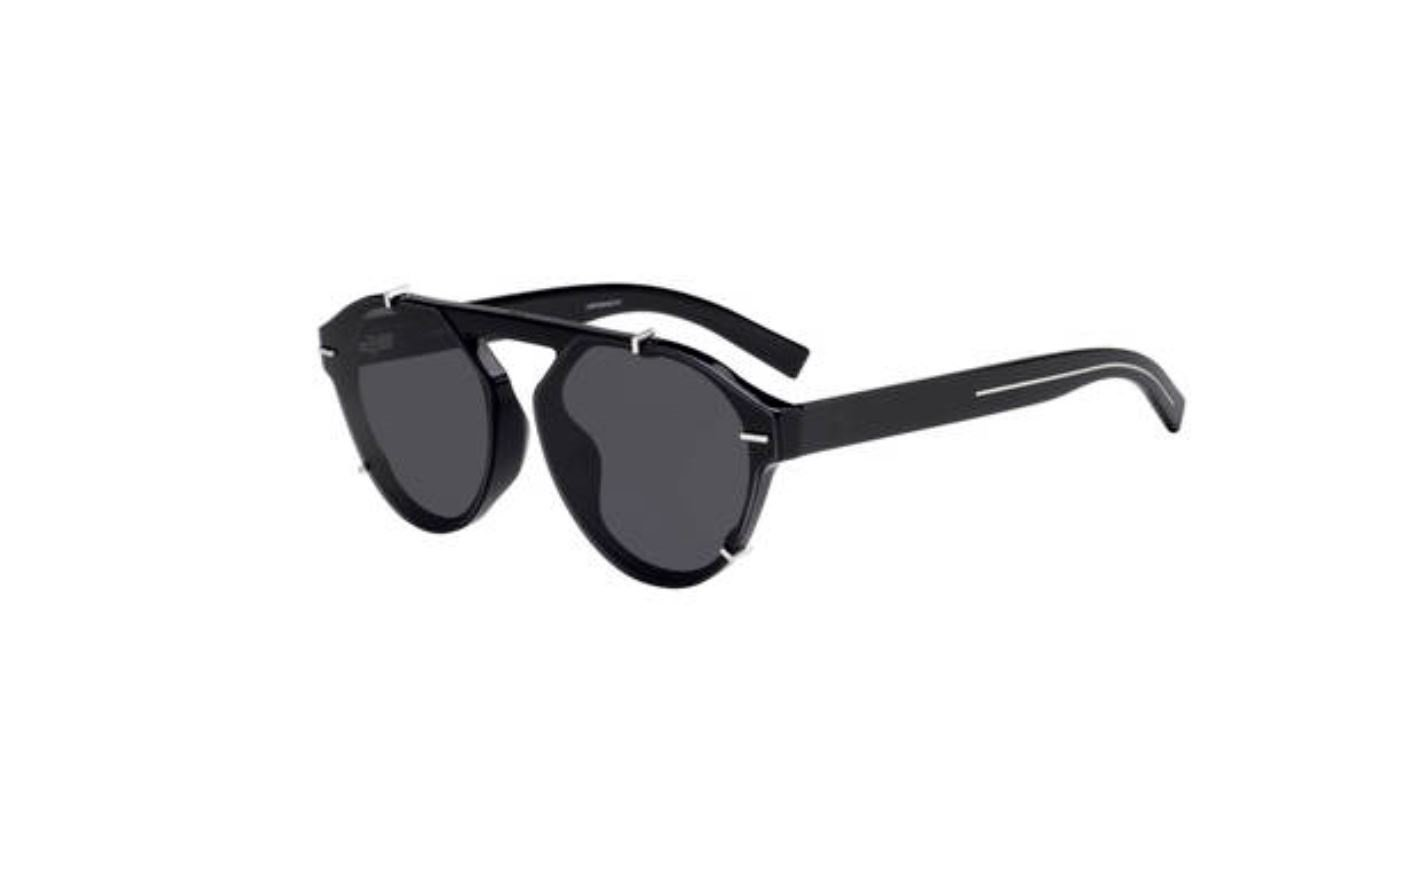 8712e0a988 Authentic Christian Dior Homme Black tie 254 FS 0807 2K Black Sunglasses